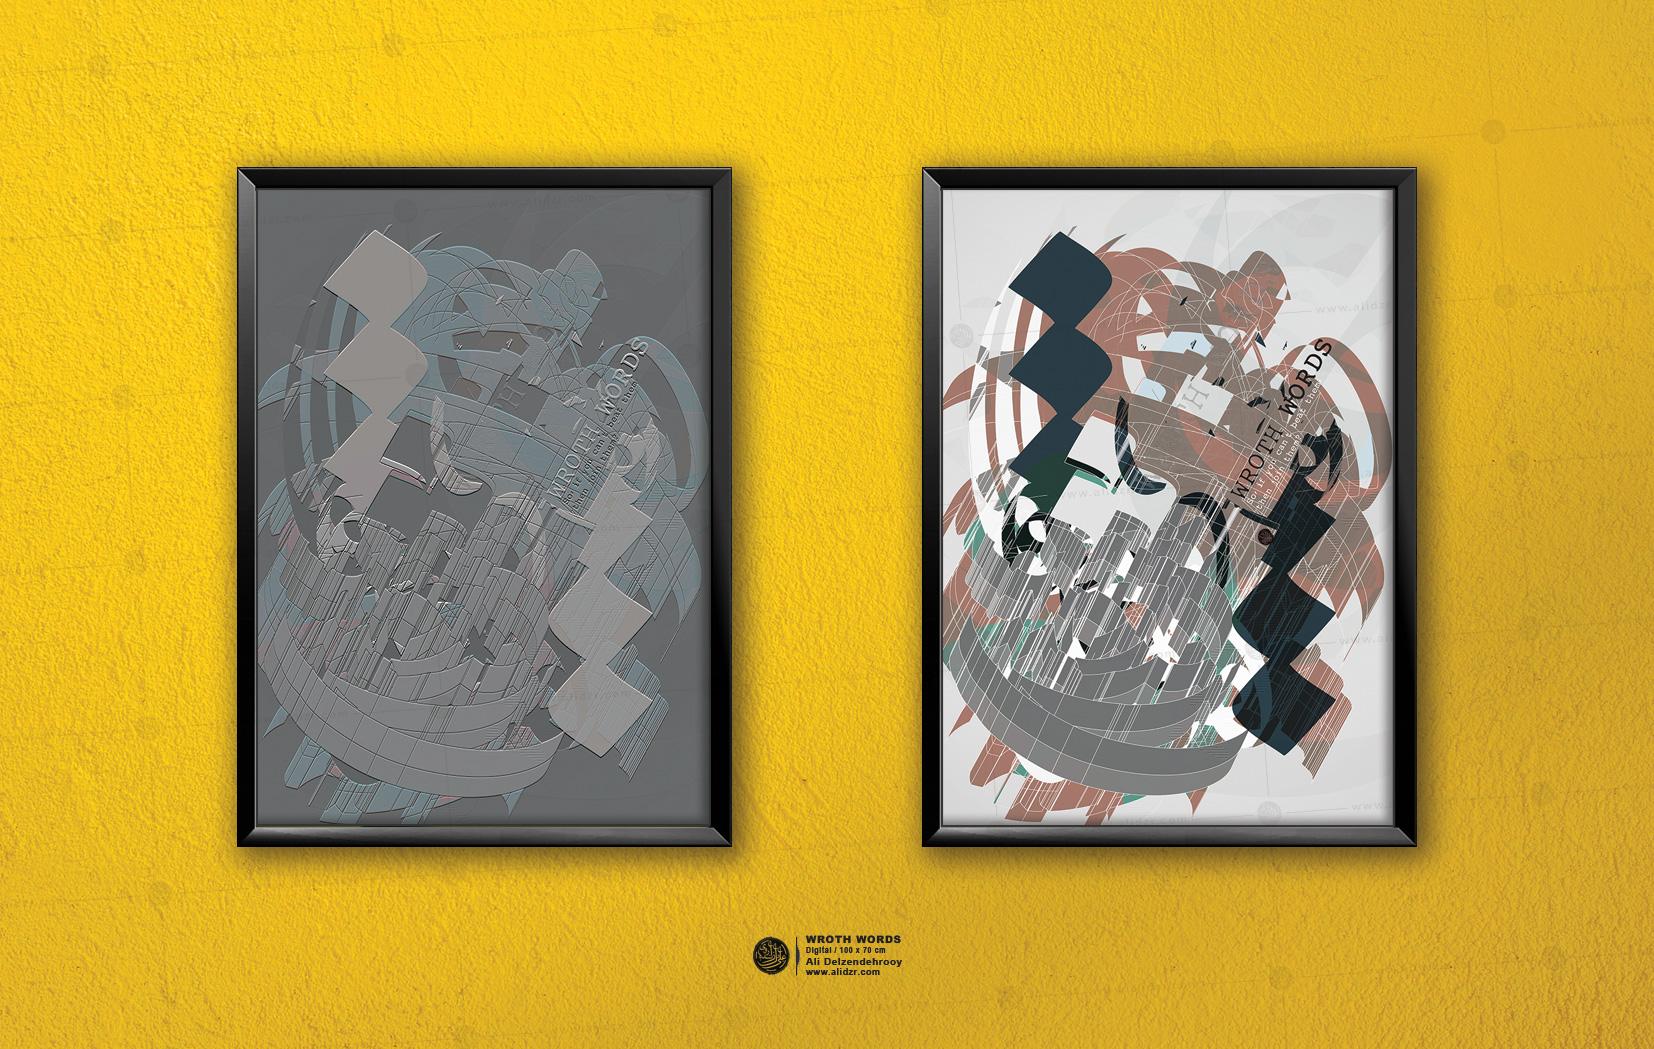 typography,calligraphy,art,design,alidelzendehrooy,alidzr,تایپوگرافی,علی دل زنده روی